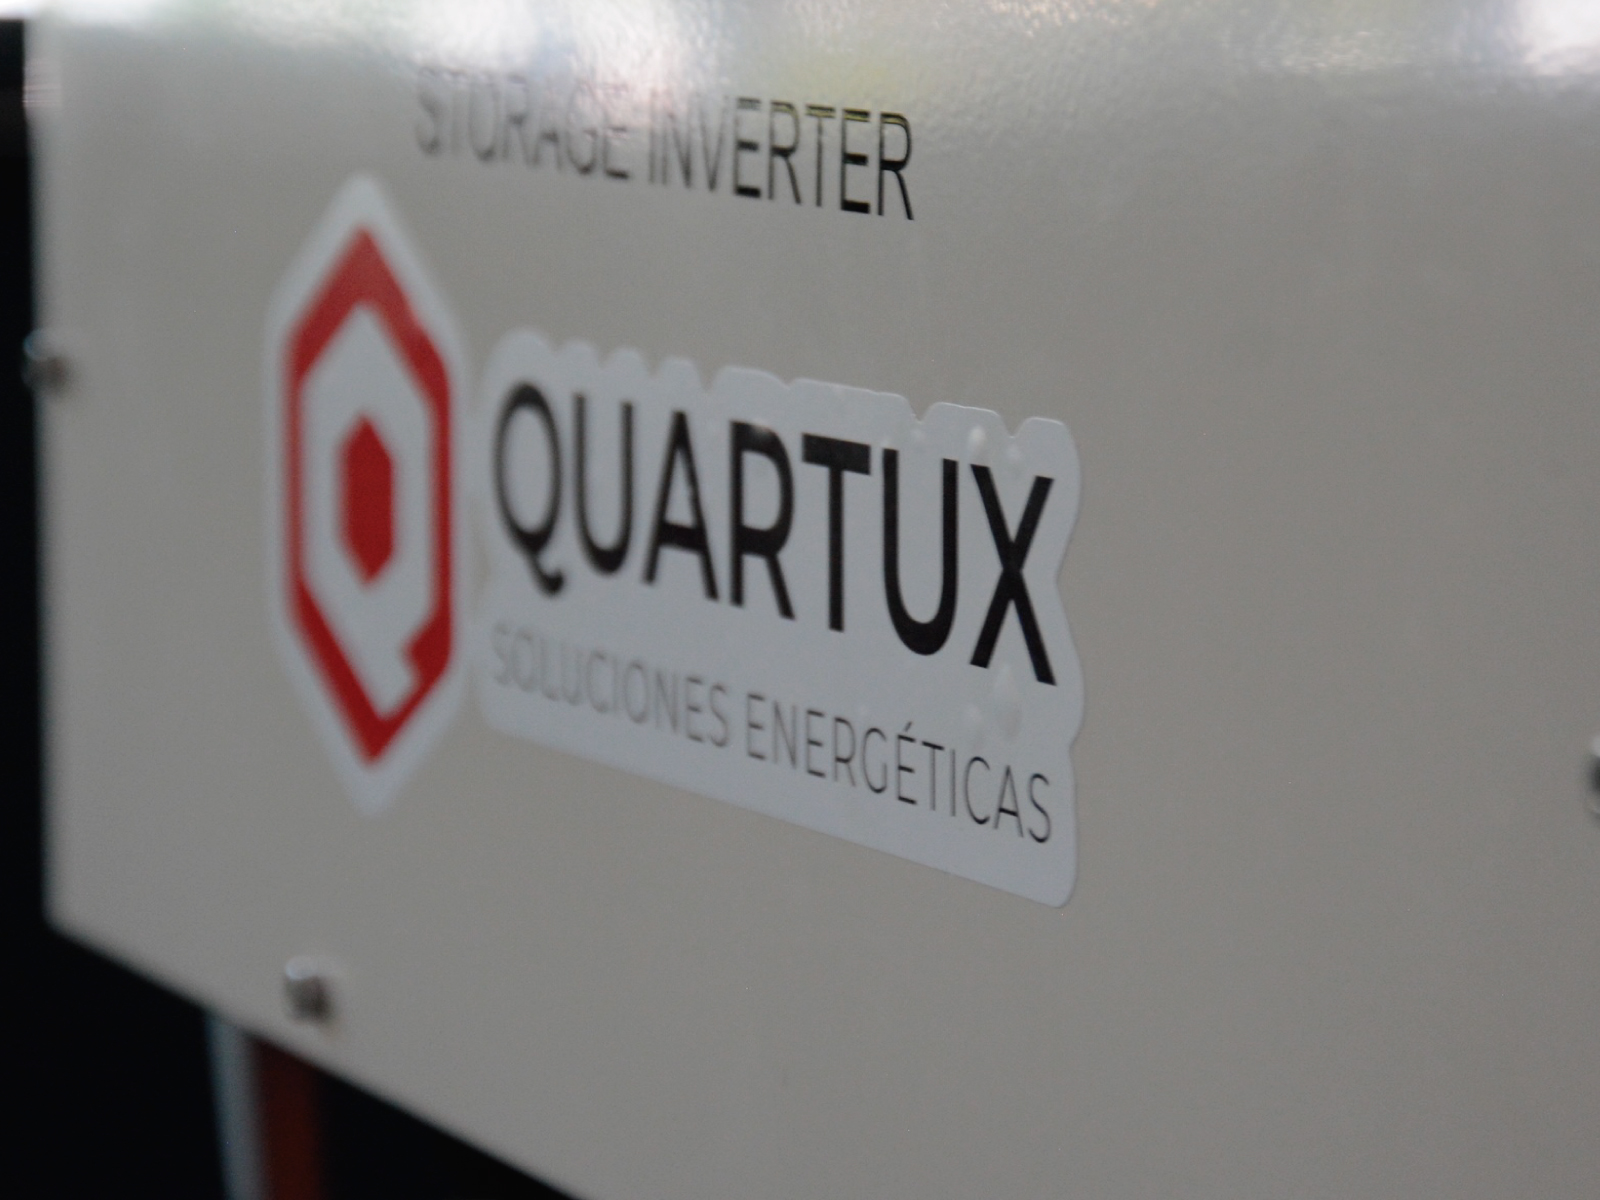 software de almacenamiento Quartuzx